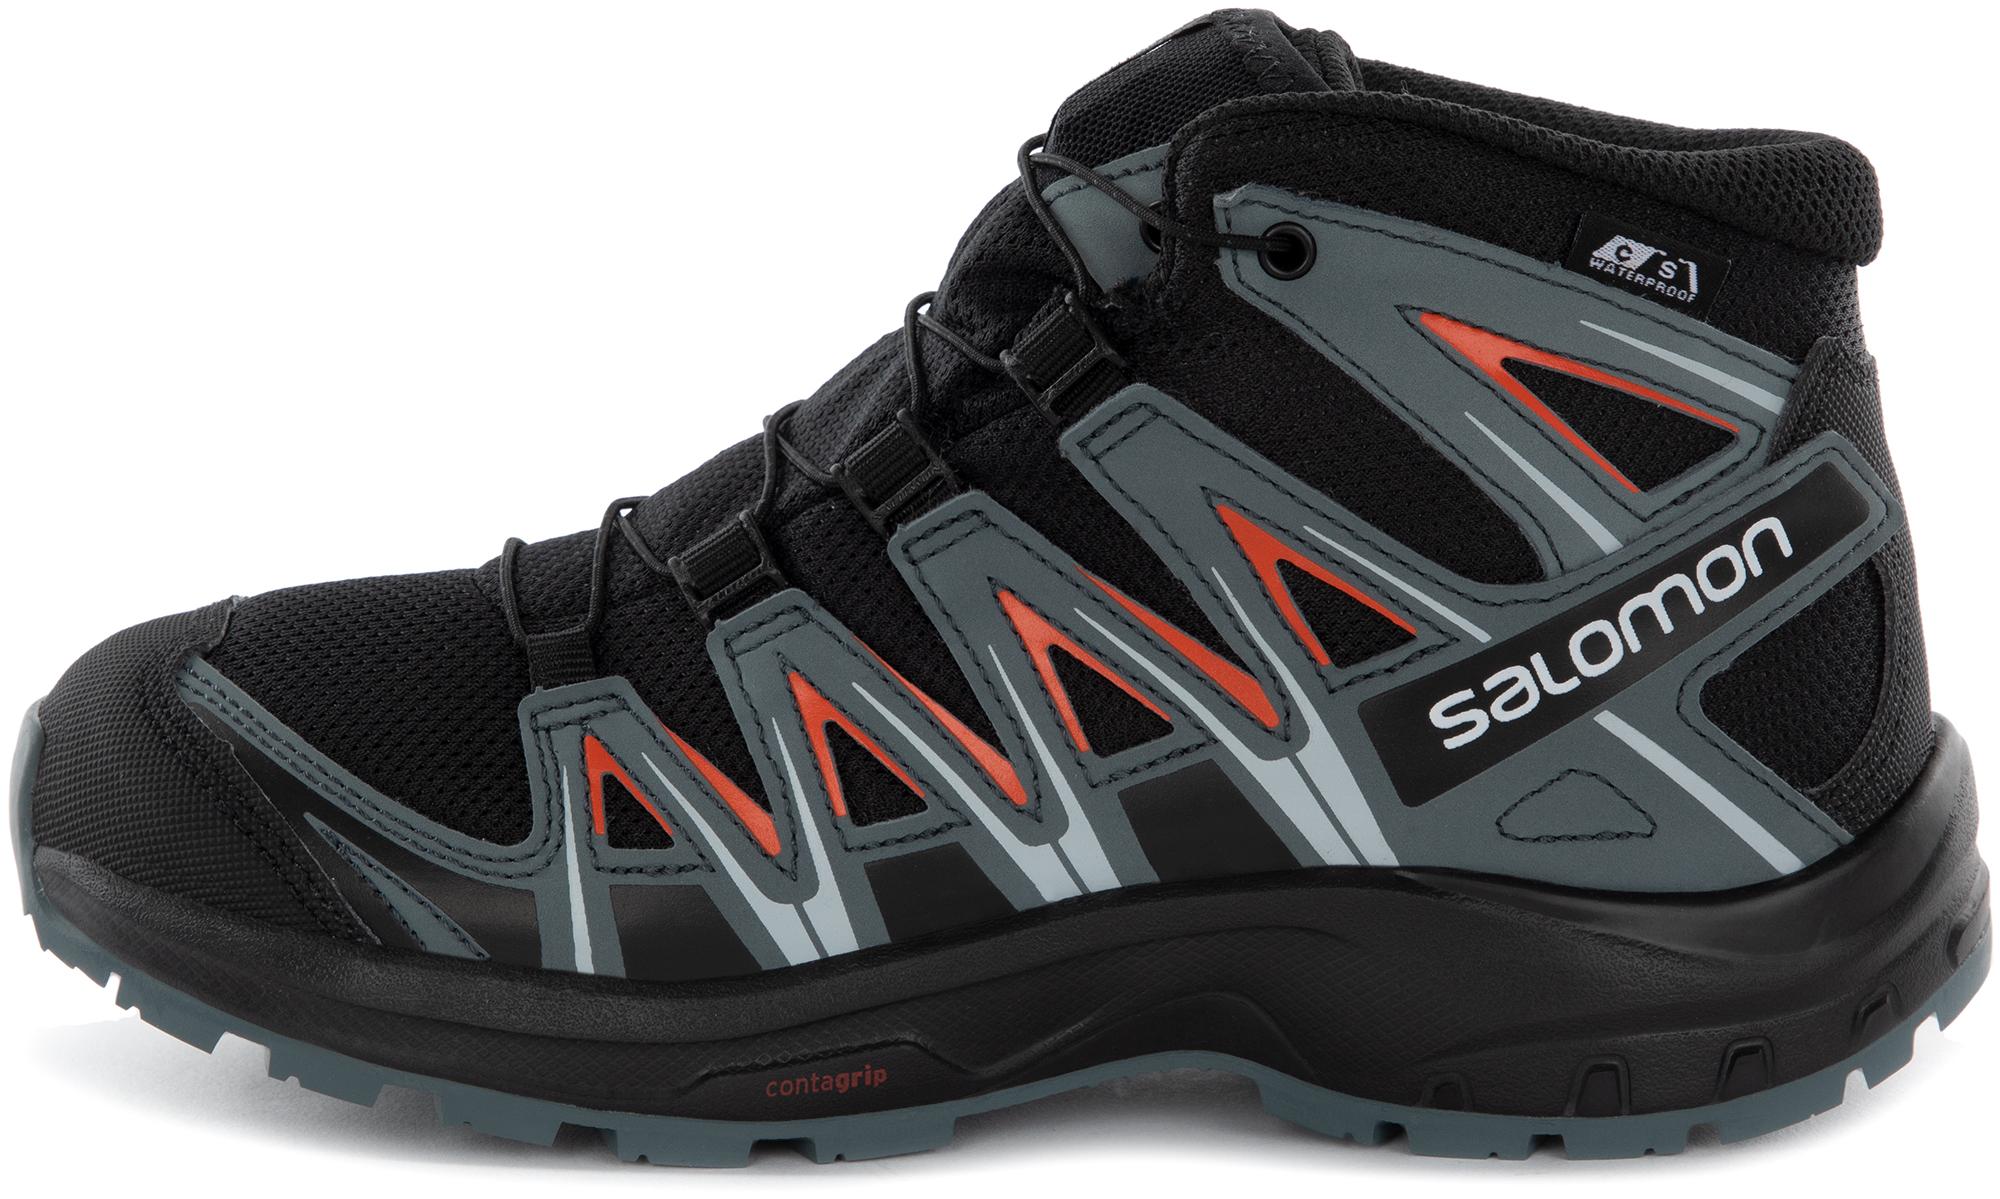 Salomon Ботинки утепленные для мальчиков Salomon XA PRO 3D MID CSWP J, размер 35